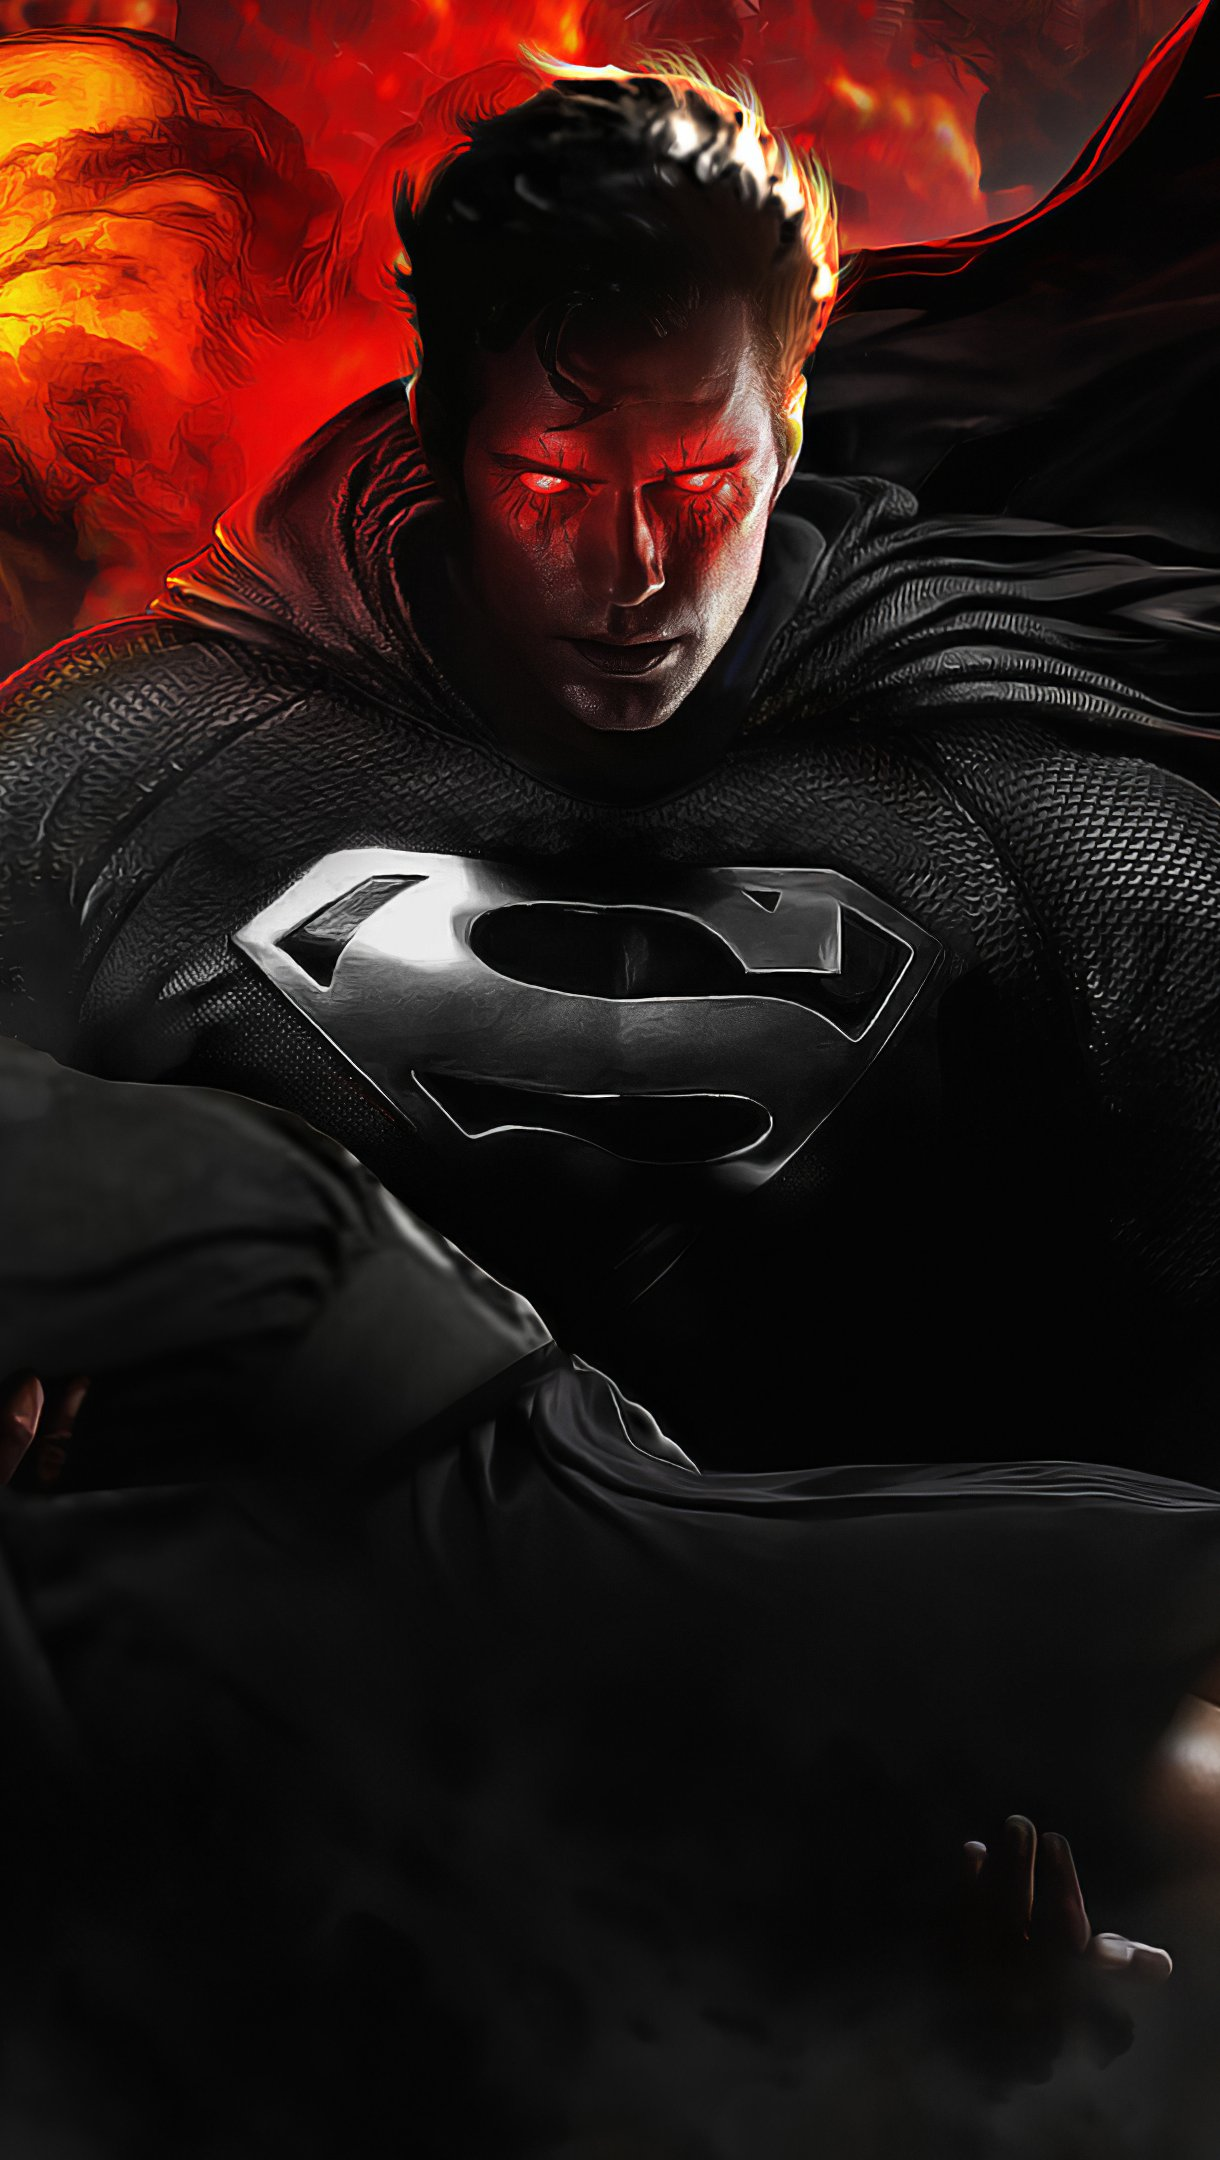 Fondos de pantalla Superman en Liga de la Justicia Vertical